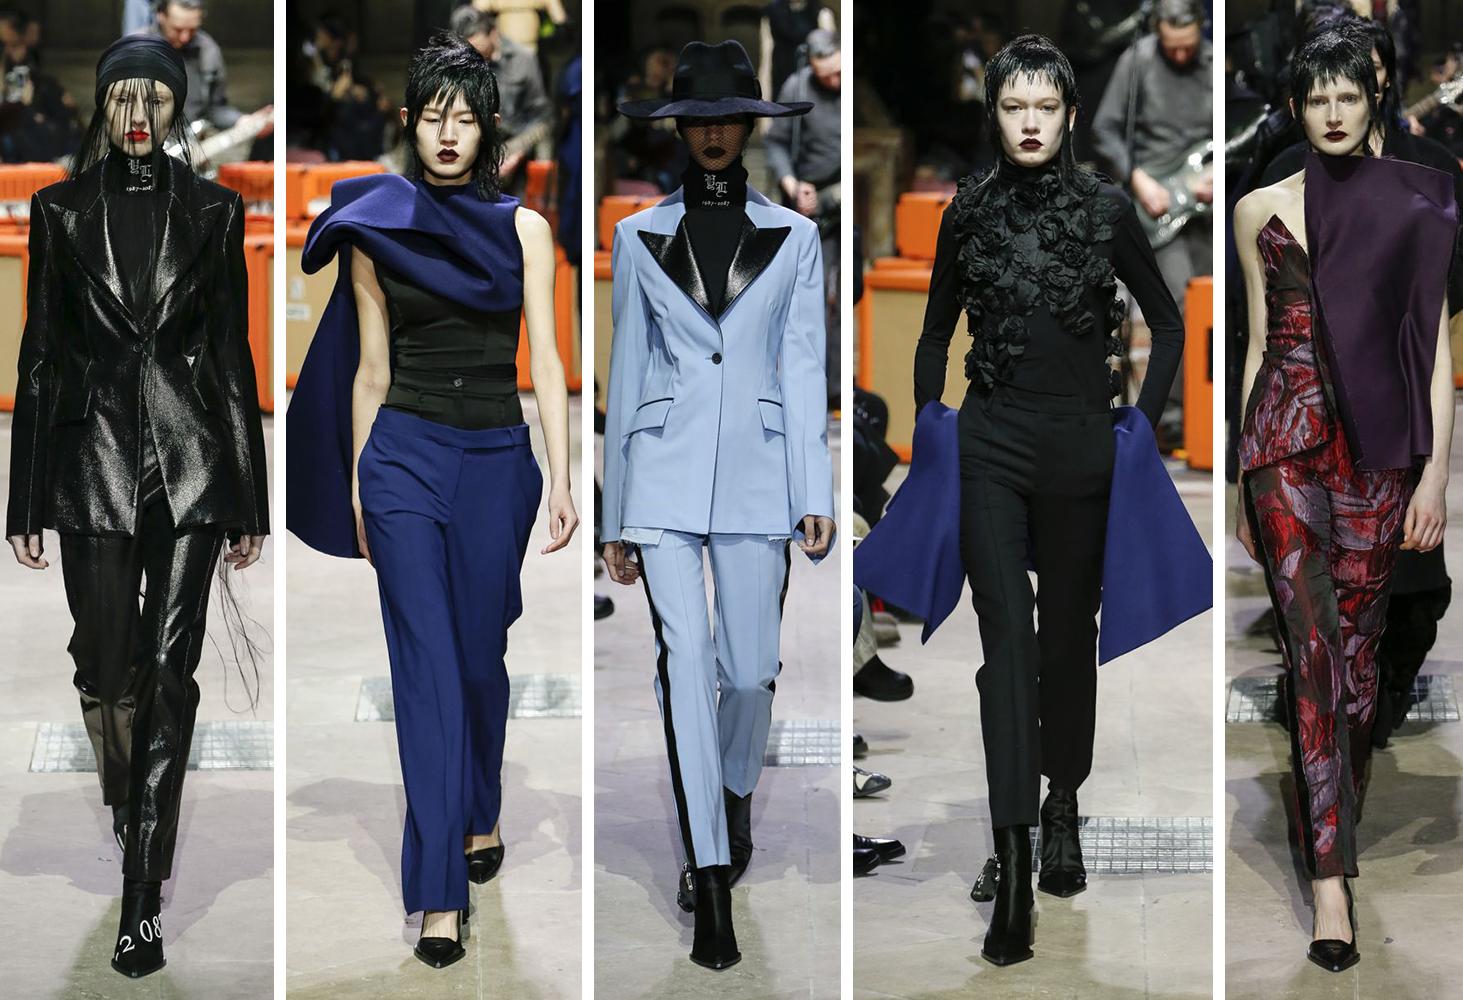 yang_li_parizsi_divathet_oszi-teli_ready-to-wear_kollekcio_2018.png